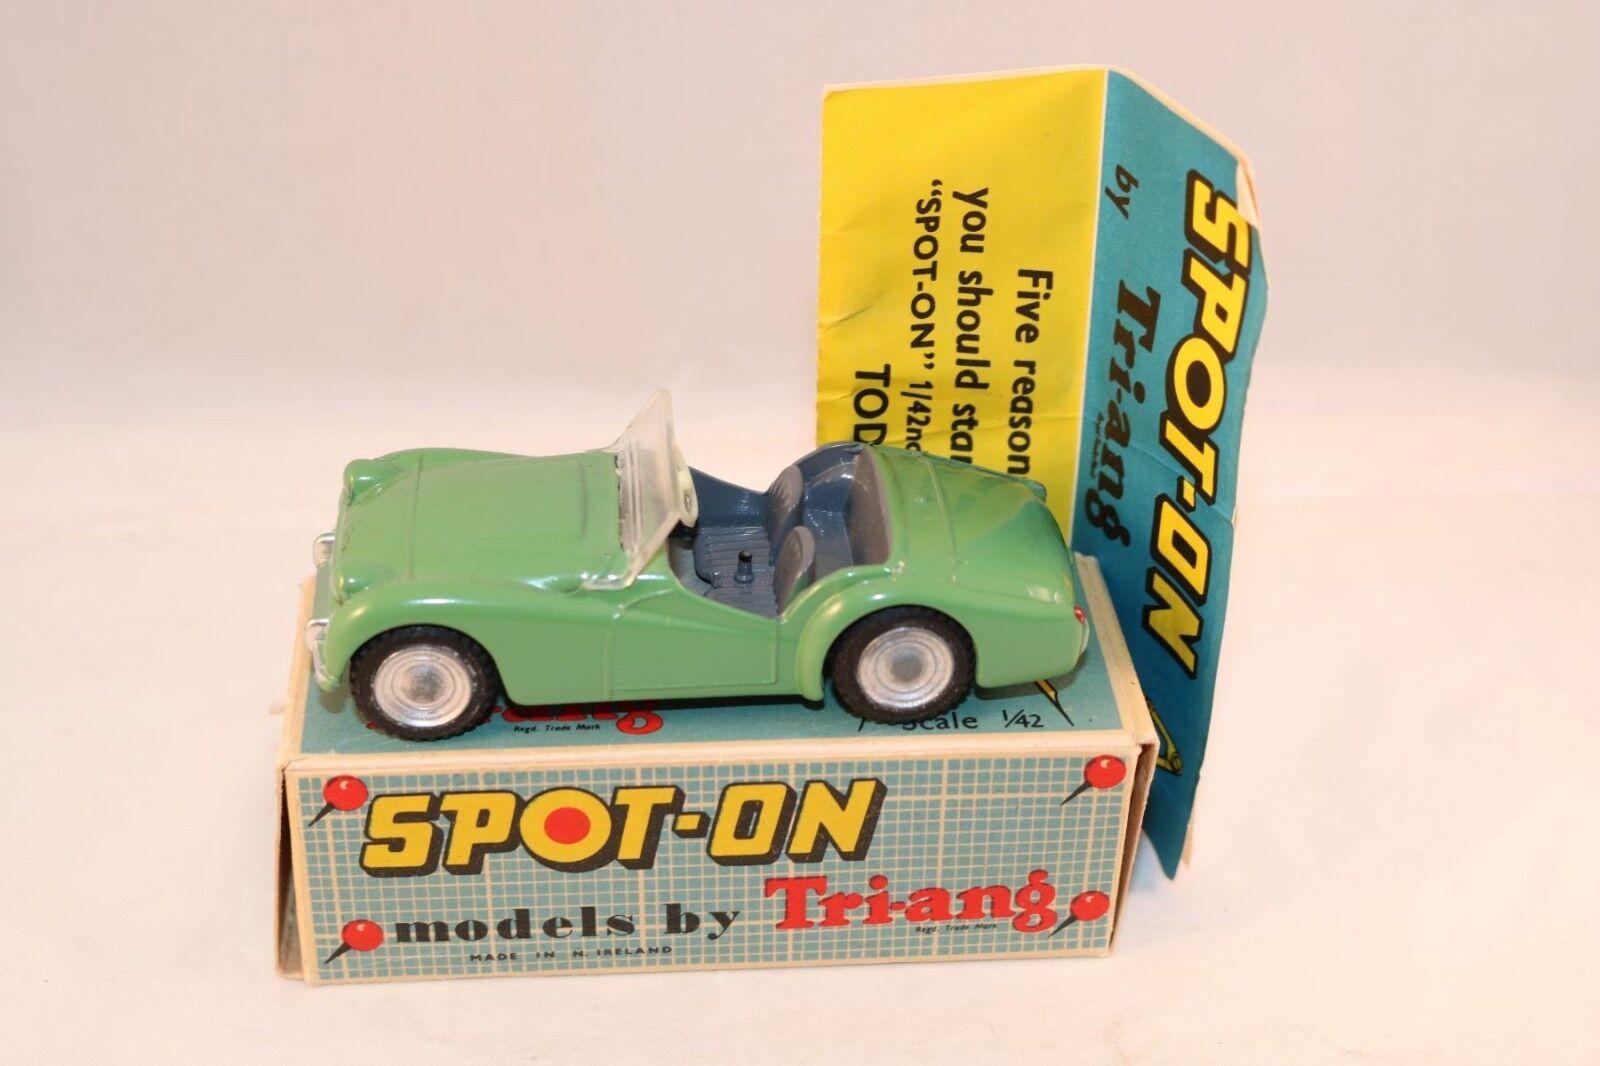 hasta un 50% de descuento Spot-on Spot-on Spot-on Spoton Triang No 108 Triumph  T.R.3  verde perfect mint in box súperb  suministramos lo mejor